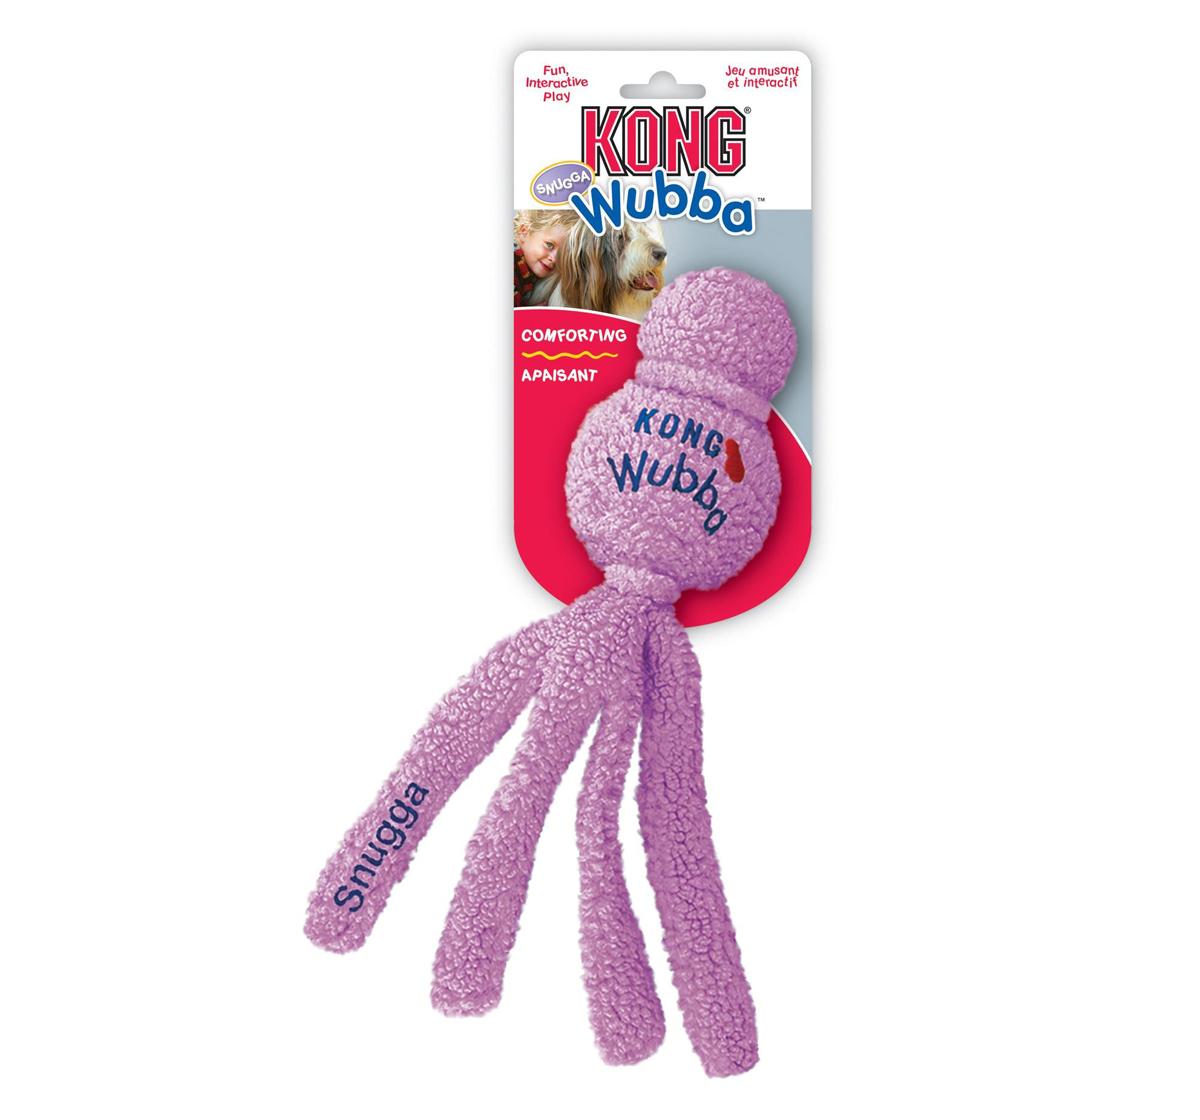 KONG Snugga Wubba Dog Toy - Large